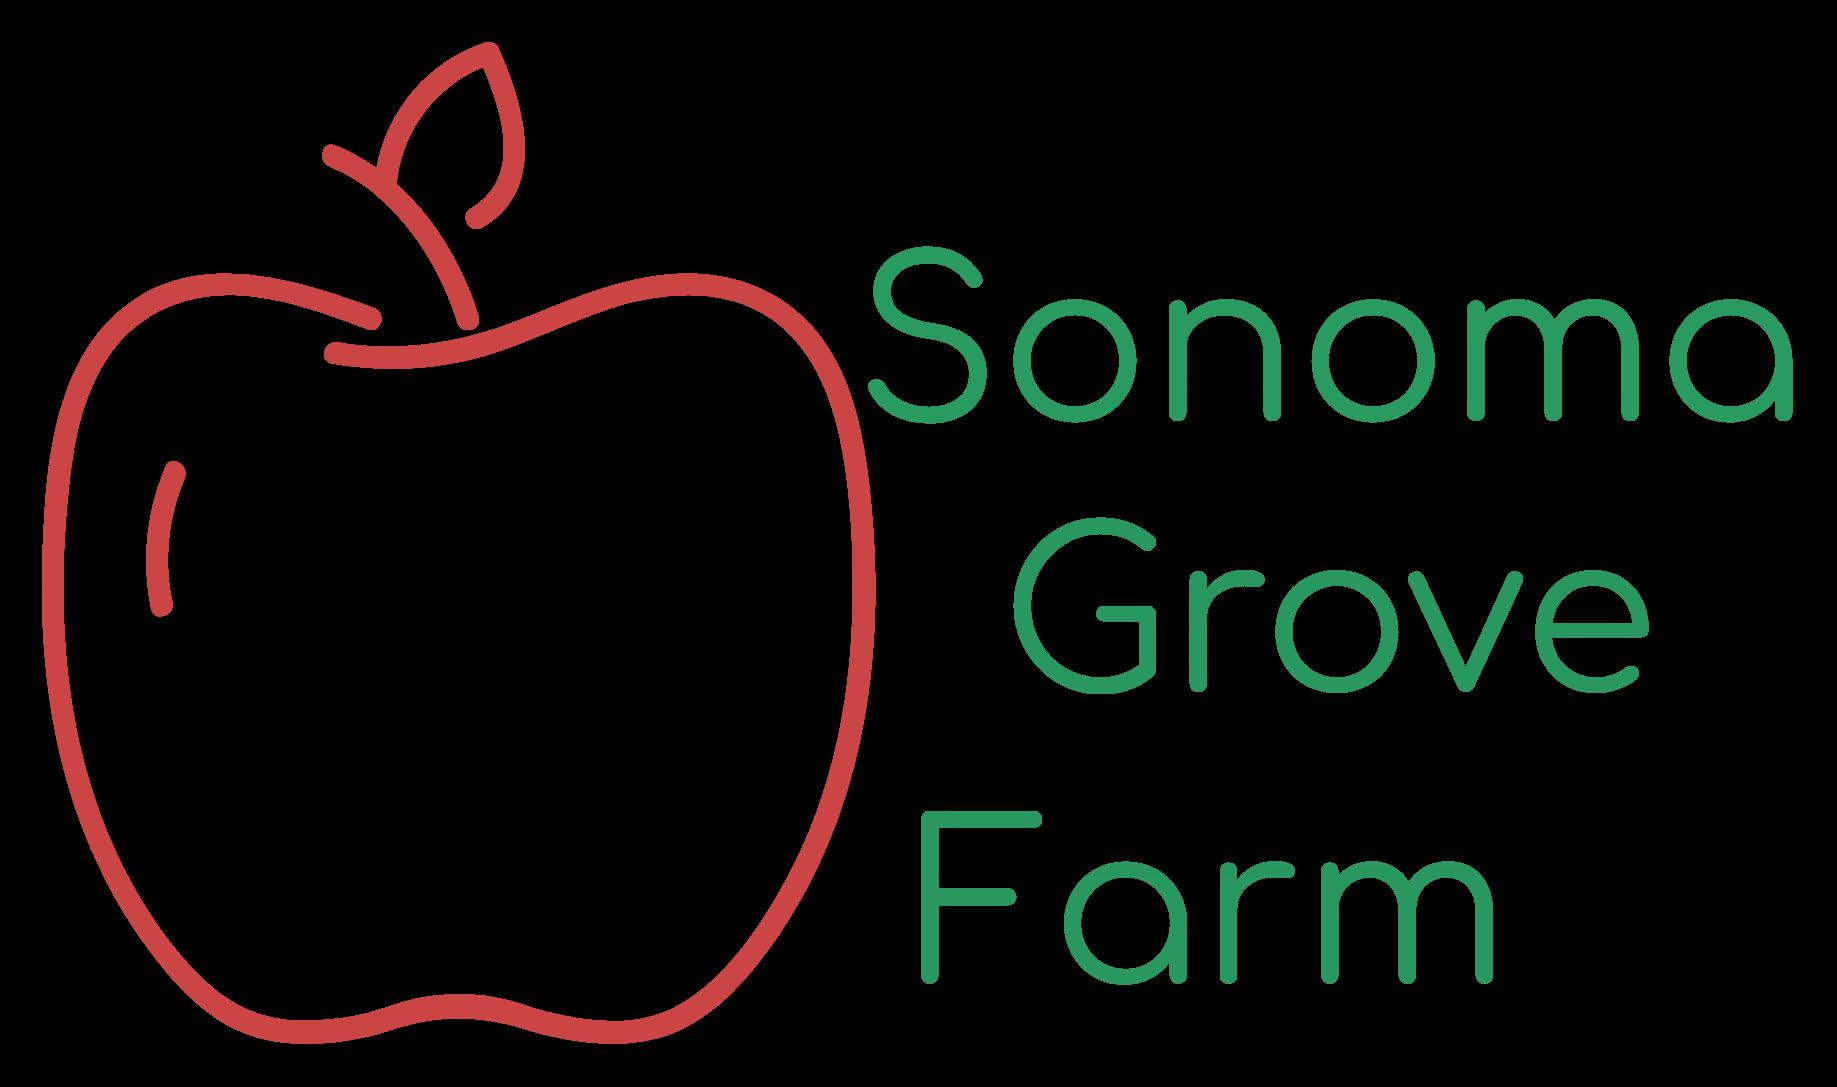 Sonoma Grove Farm